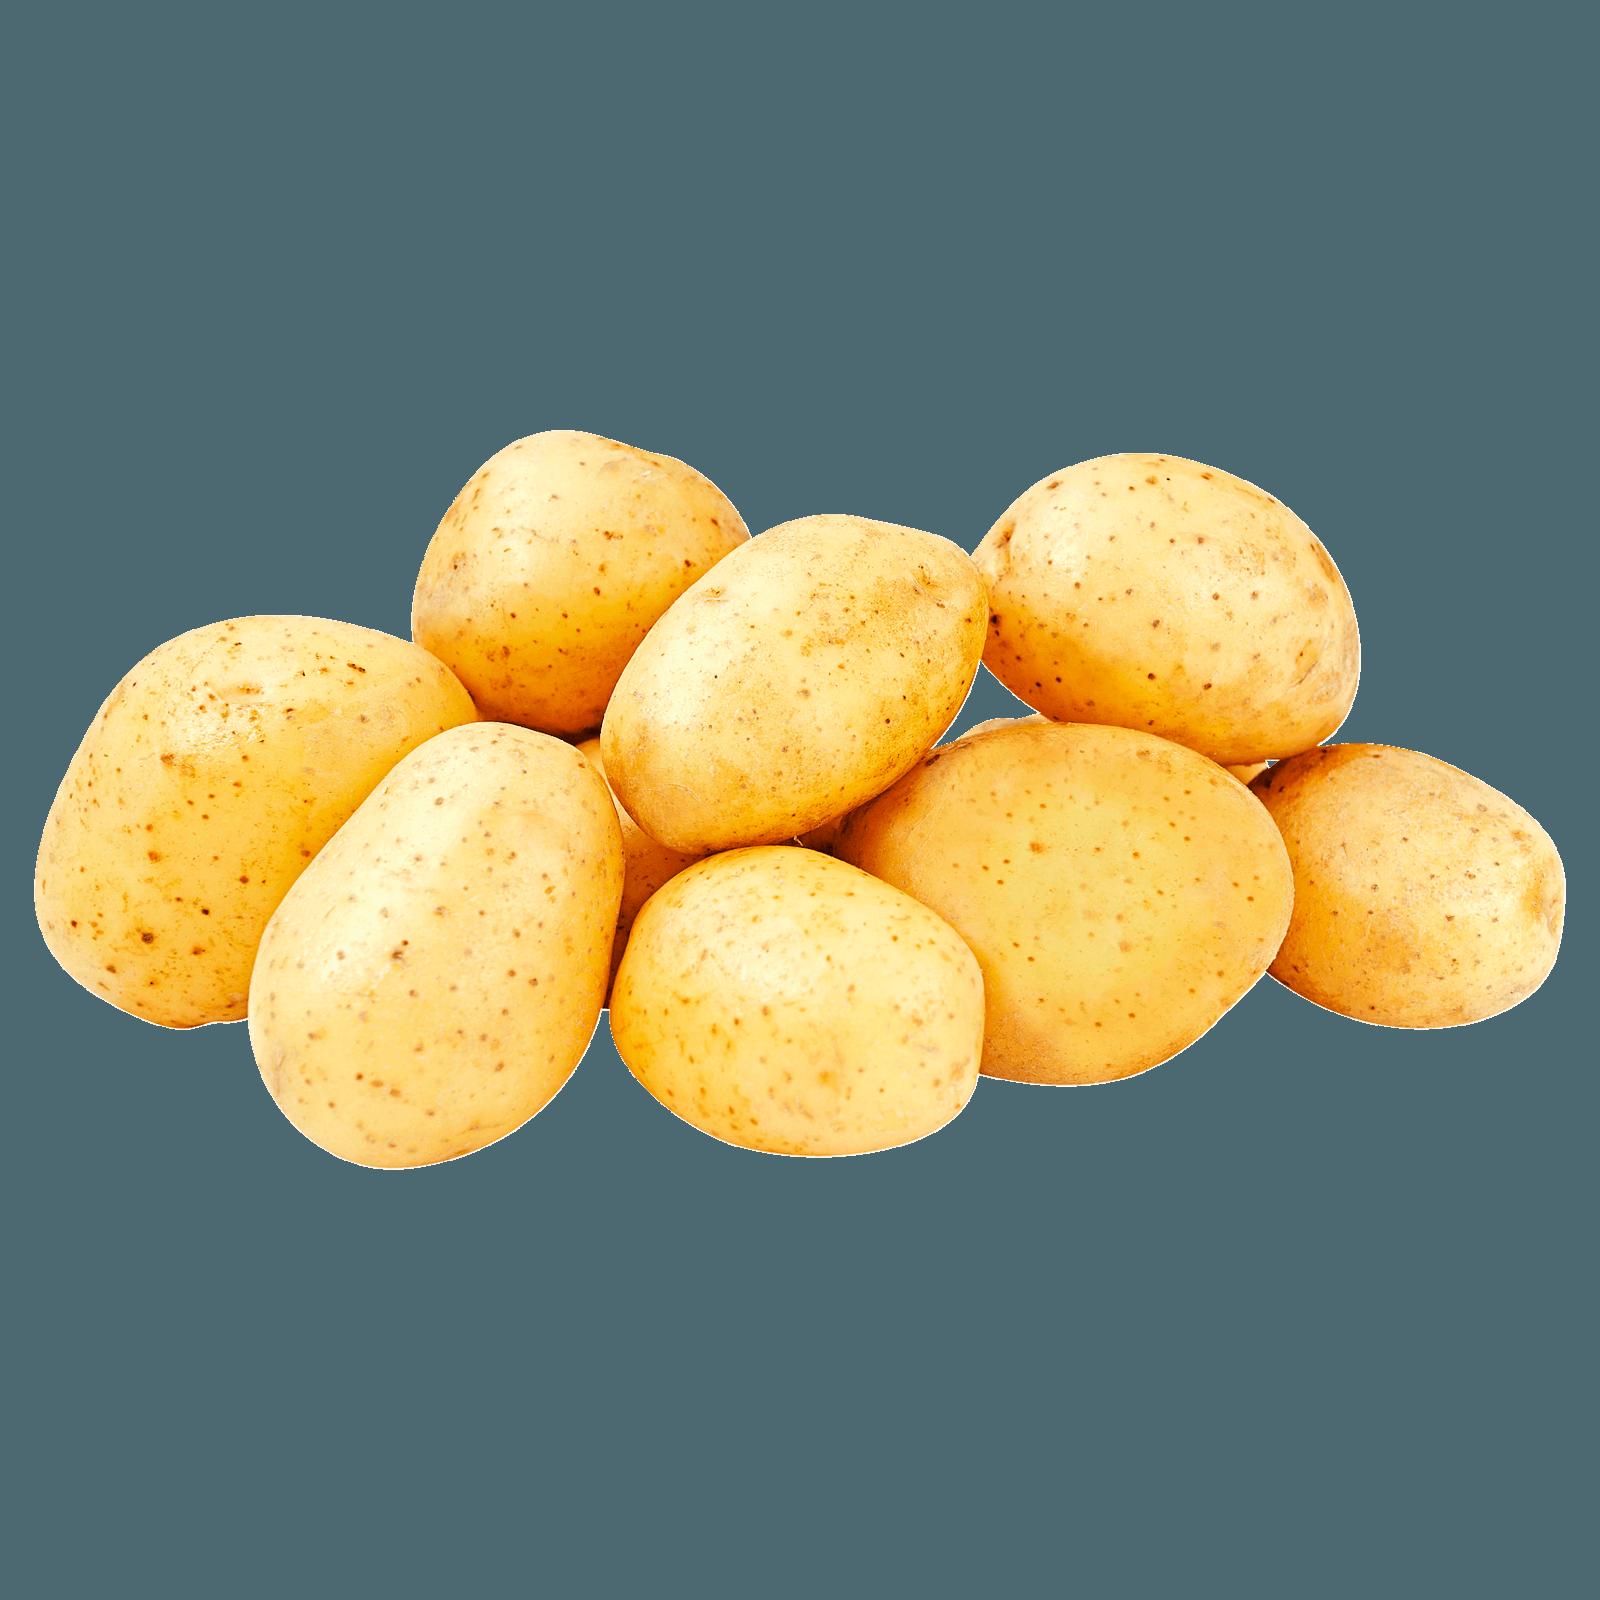 REWE Regional Speisekartoffeln mehlig kochend 2,5kg